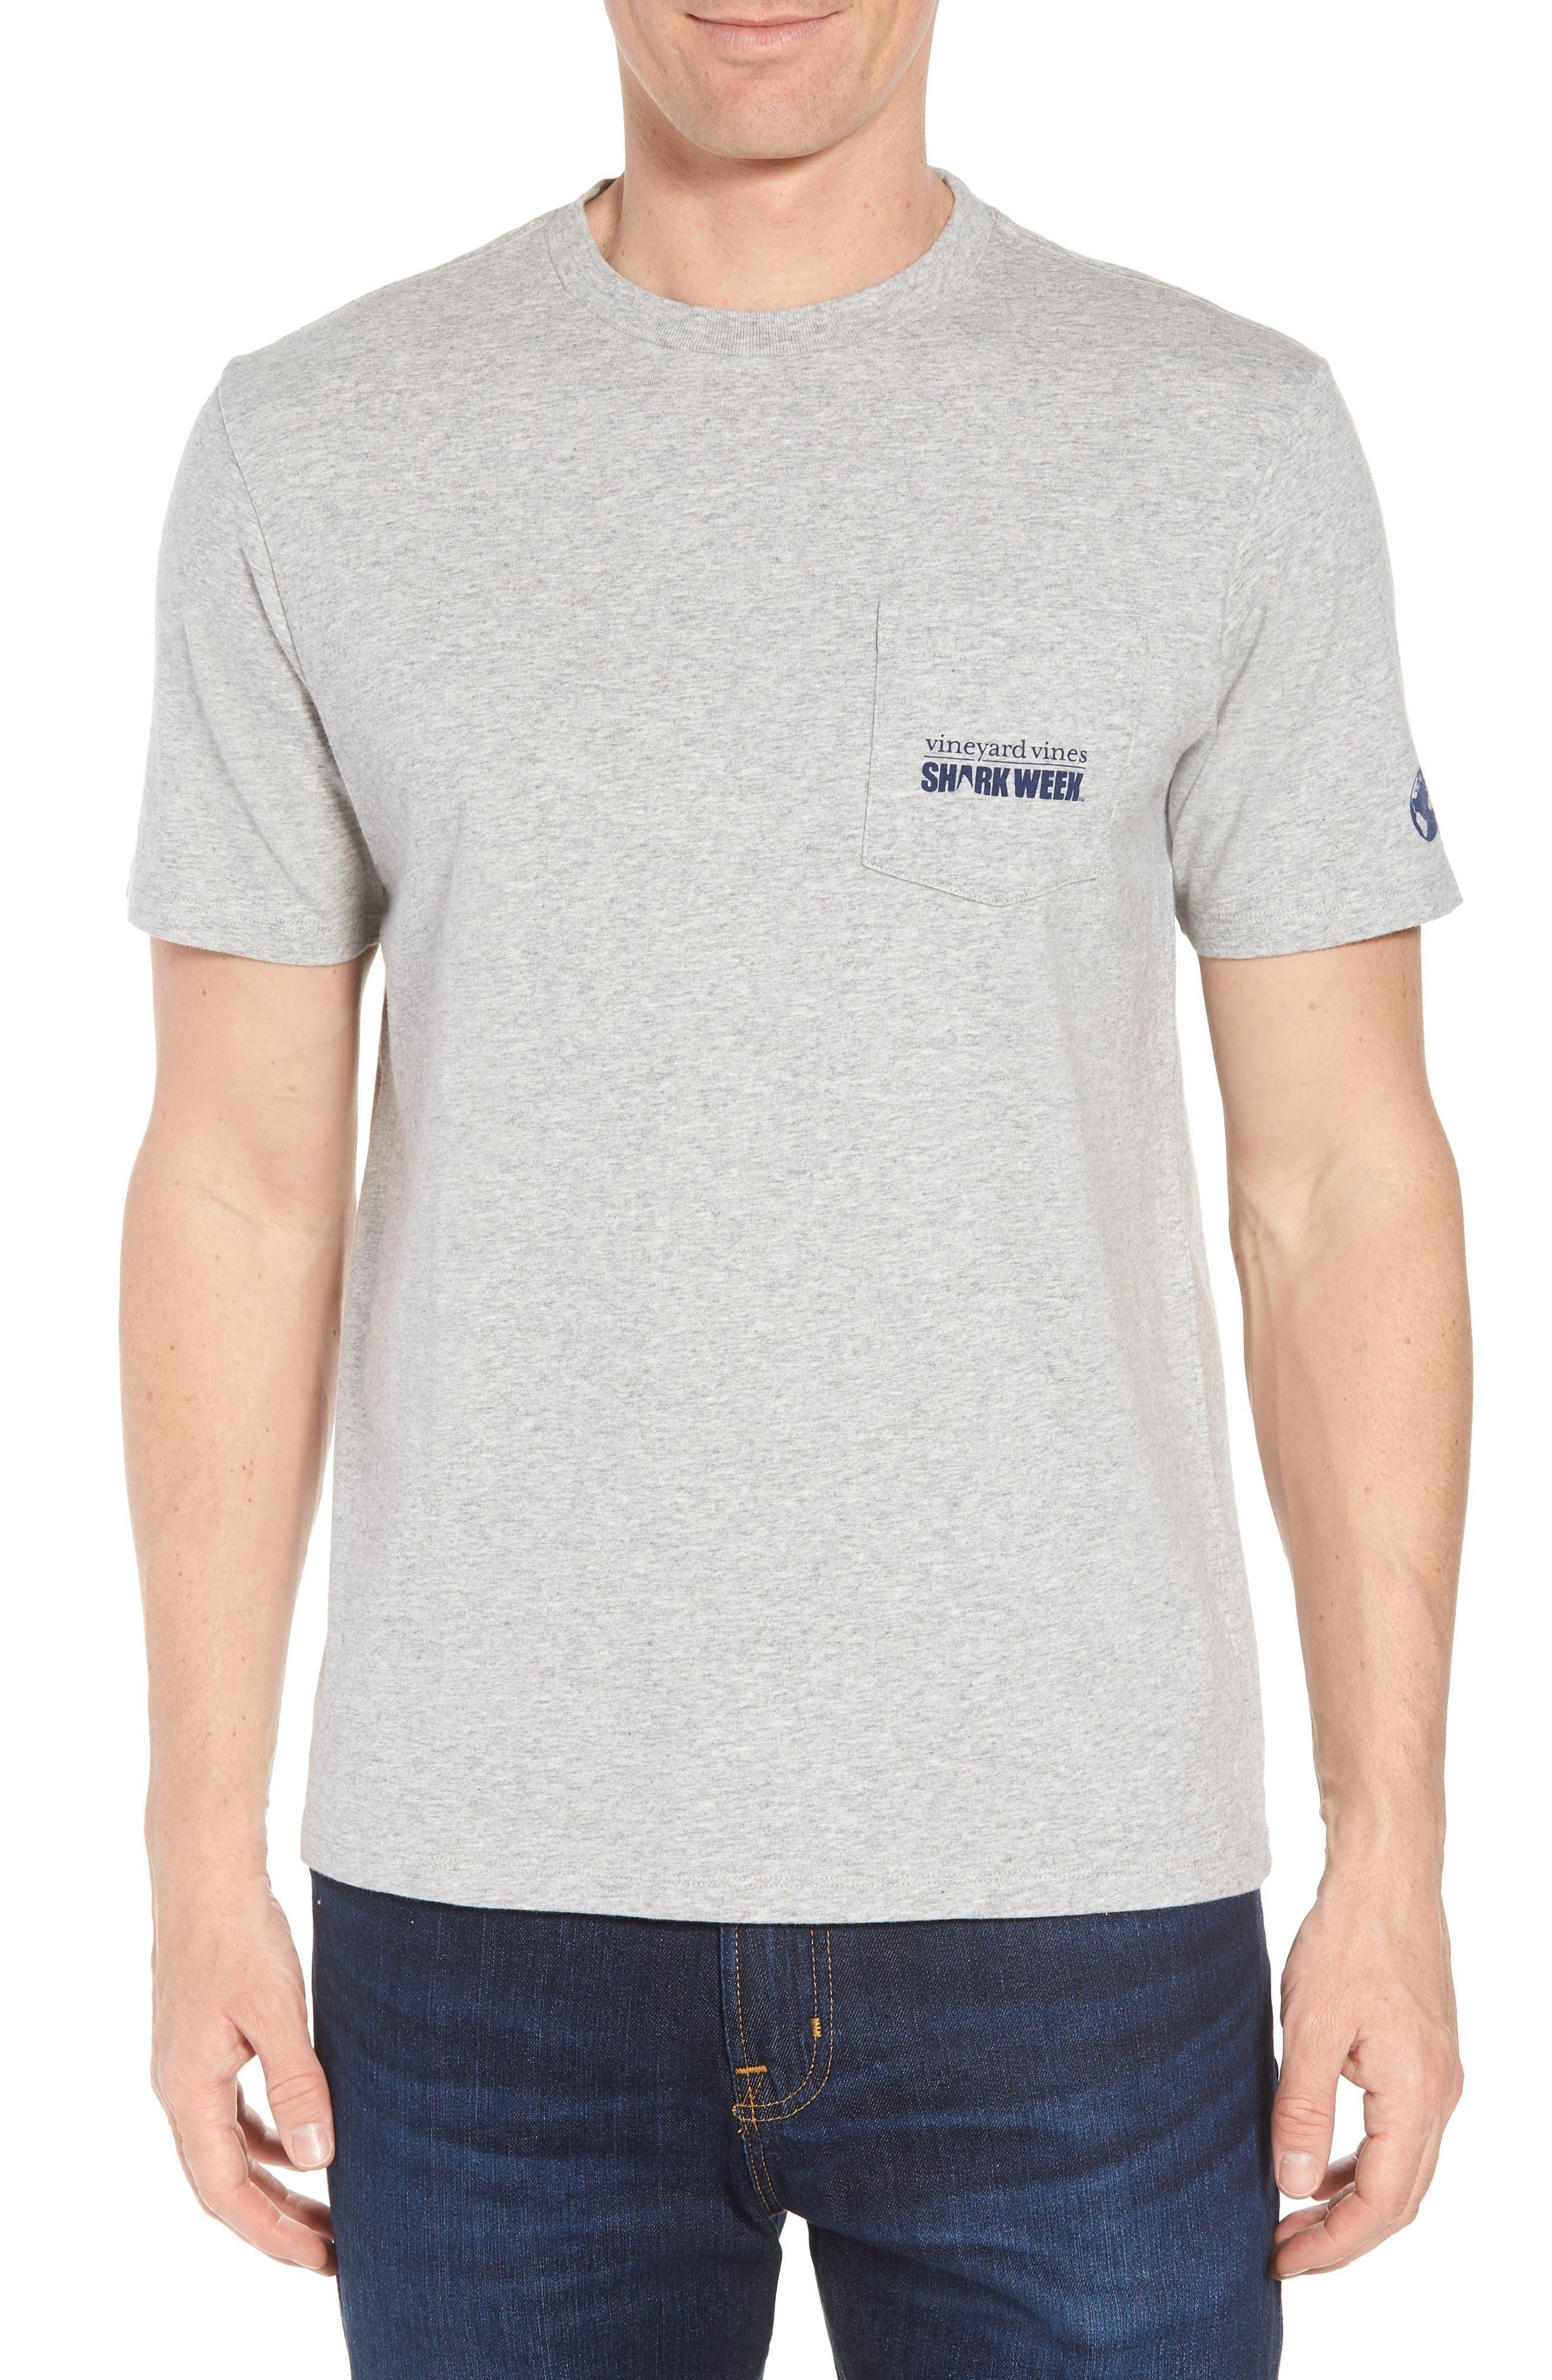 x Shark Week<sup>™</sup> Sharks & Stripes Pocket T-Shirt,                         Main,                         color, Grey Heather